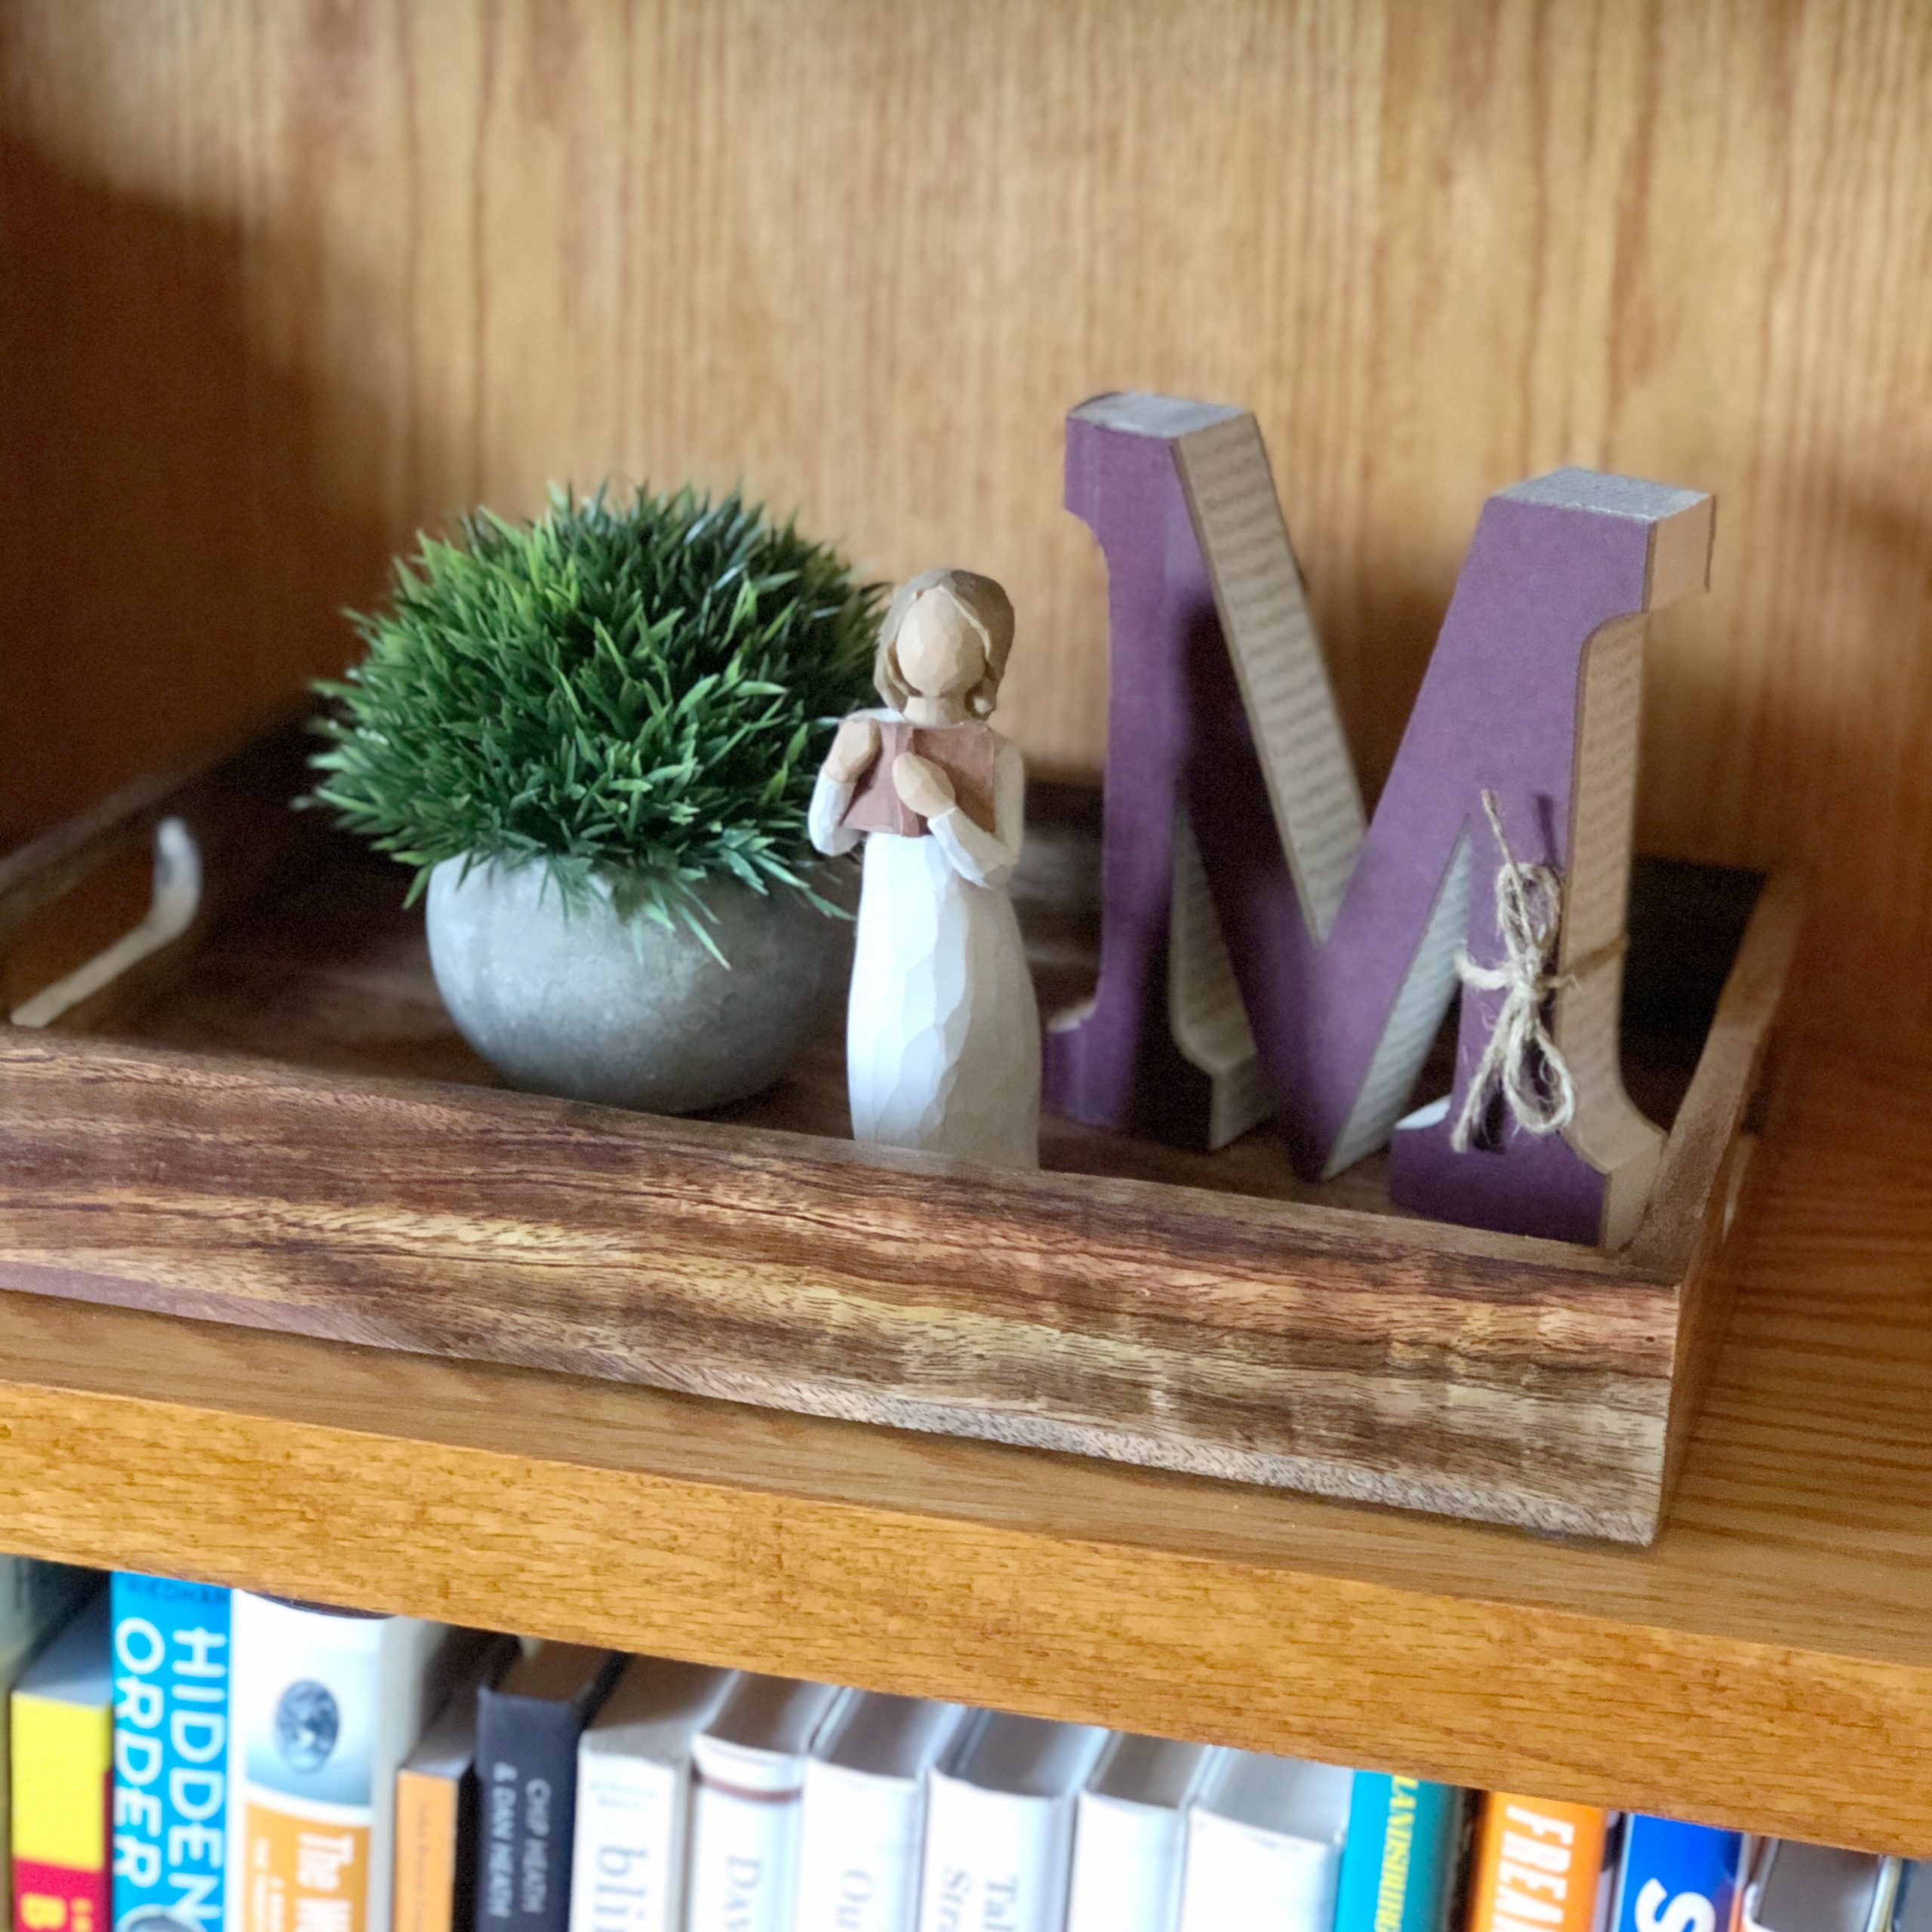 Decorative Tray with Decor Items